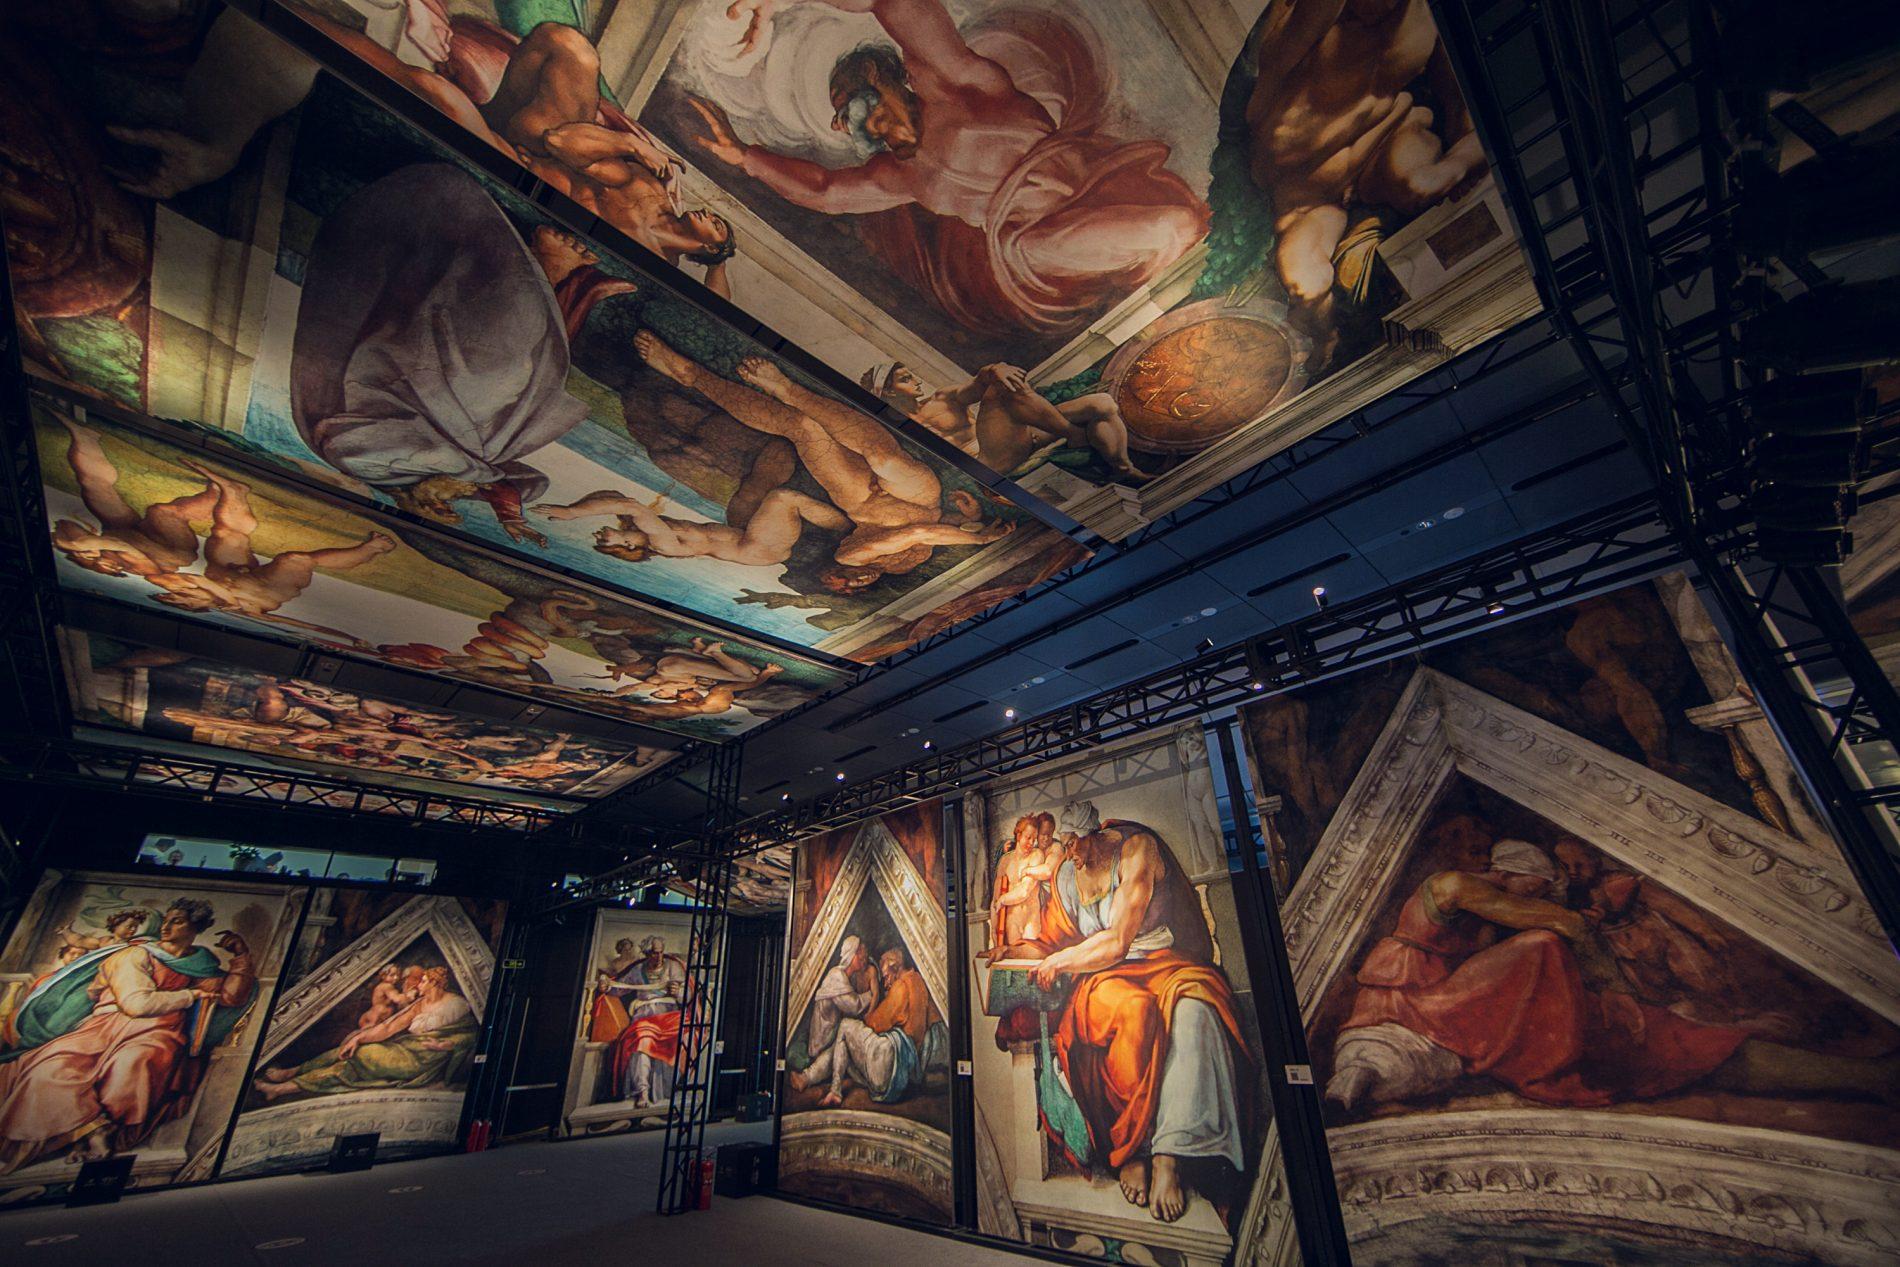 'Michelangelo's Sistine Chapel: The Exhibition' installation view.